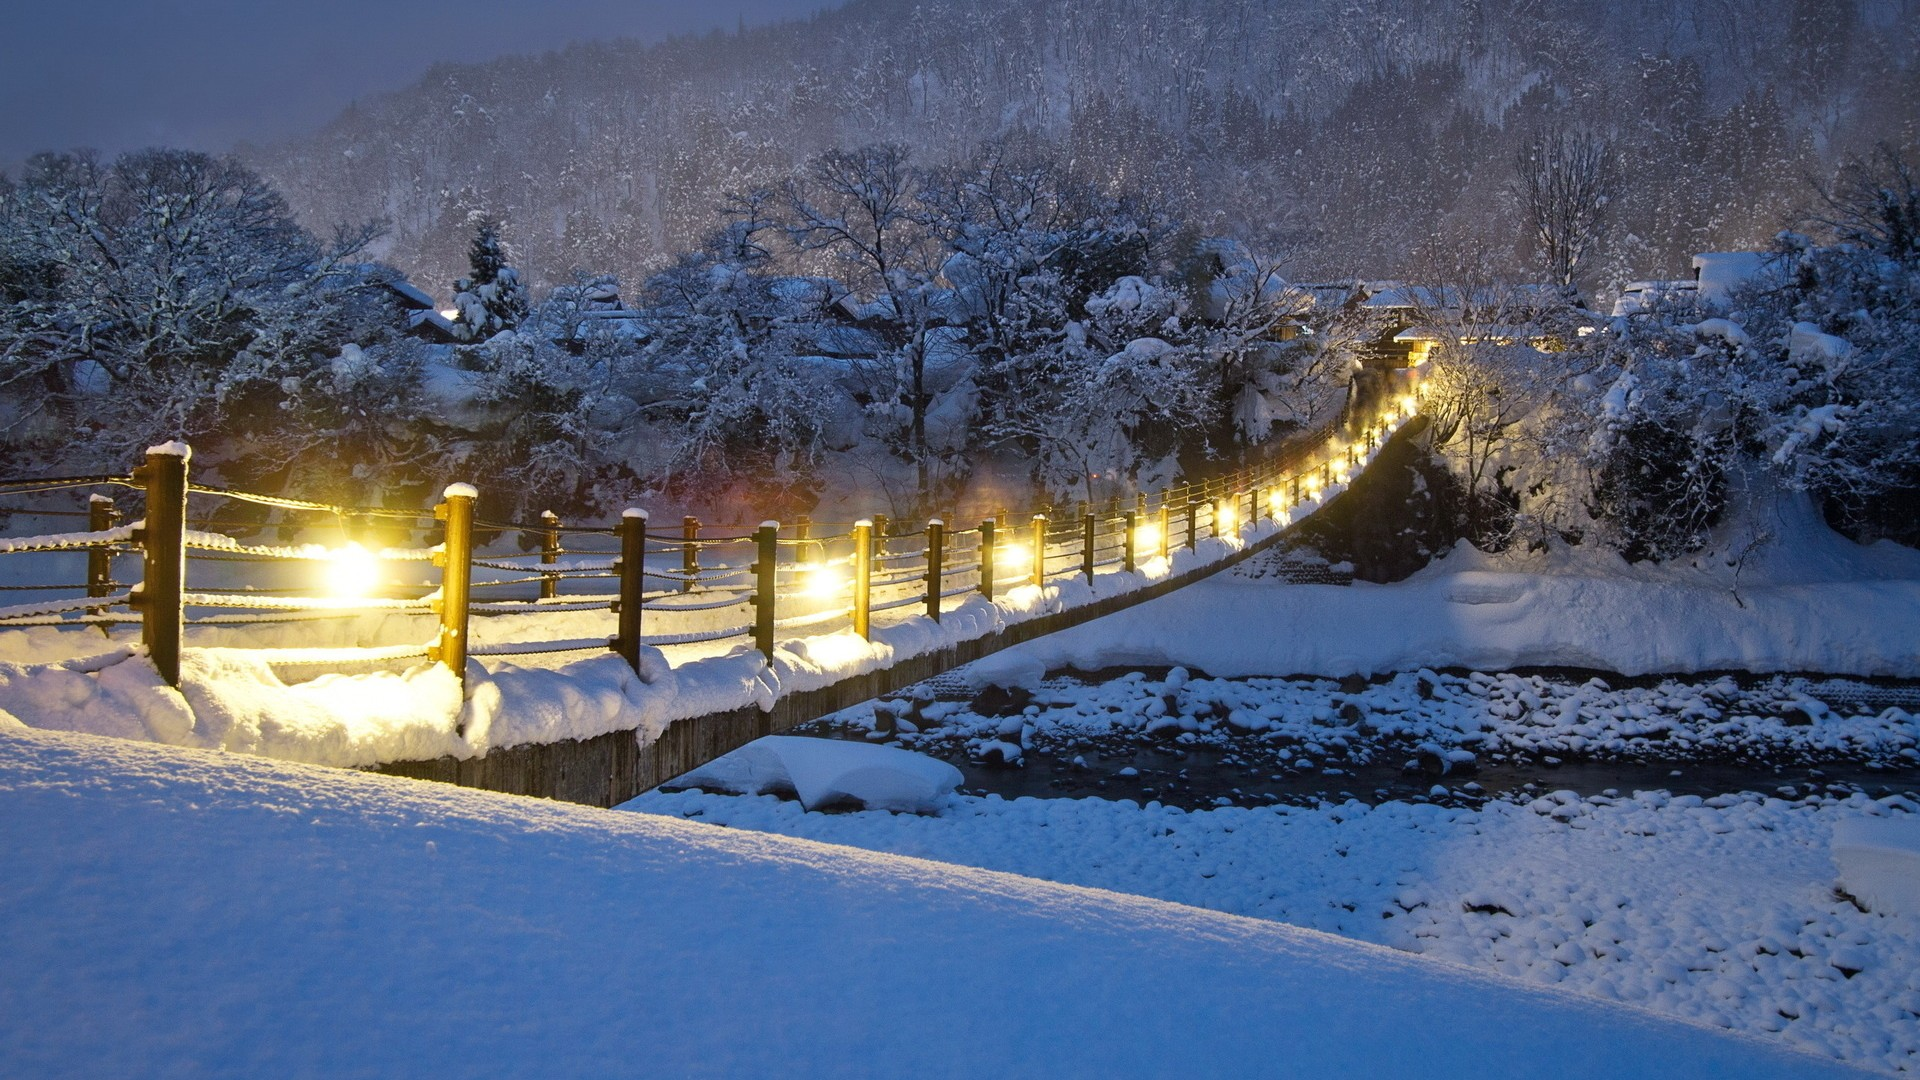 Free Christmas Falling Snow Wallpaper Download Full Hd Wallpapers 1080p Pixelstalk Net